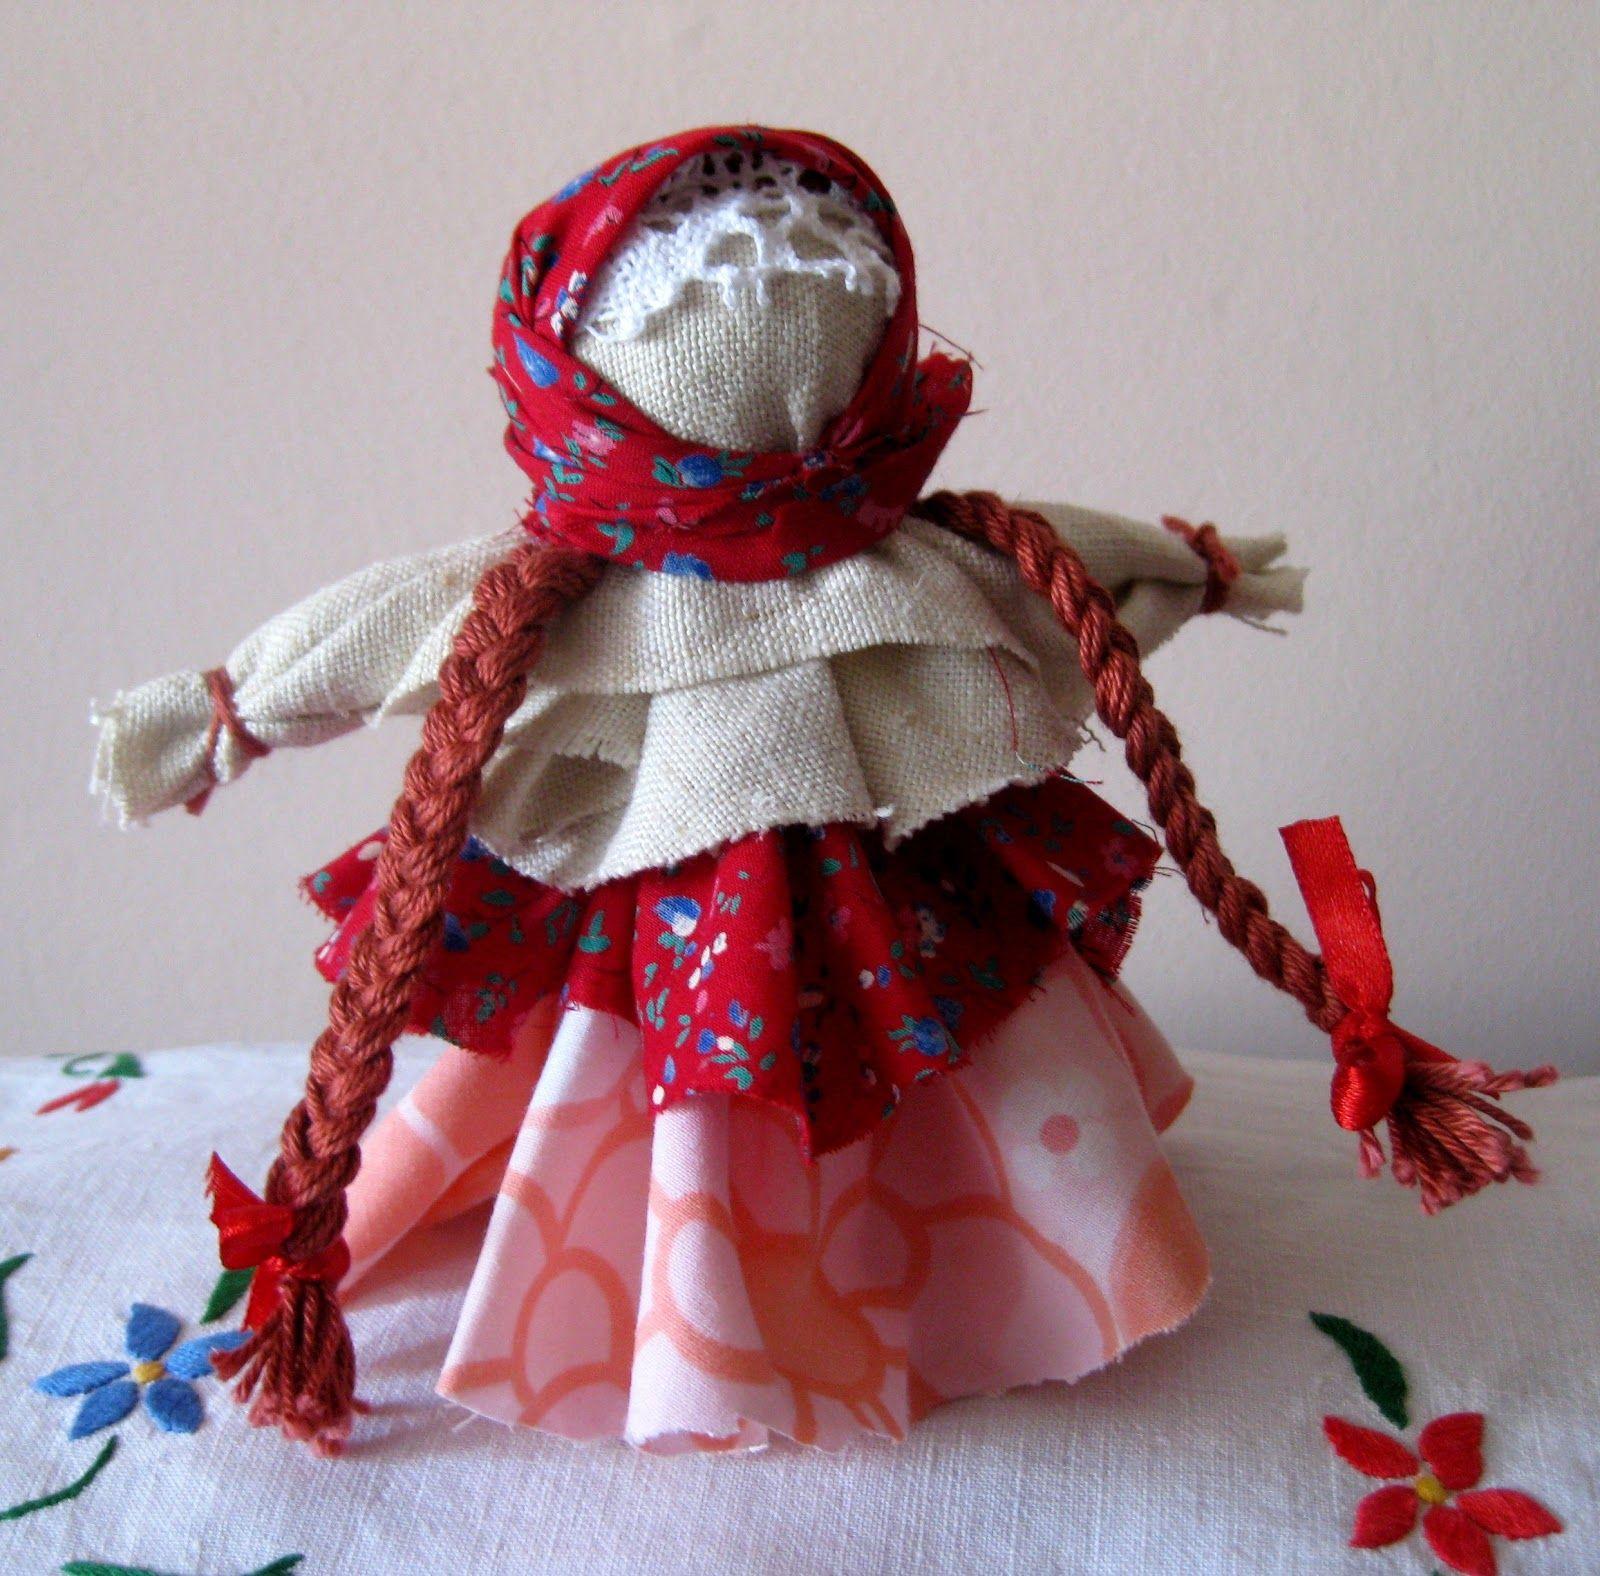 кукла оберегать своими руками мероприятии